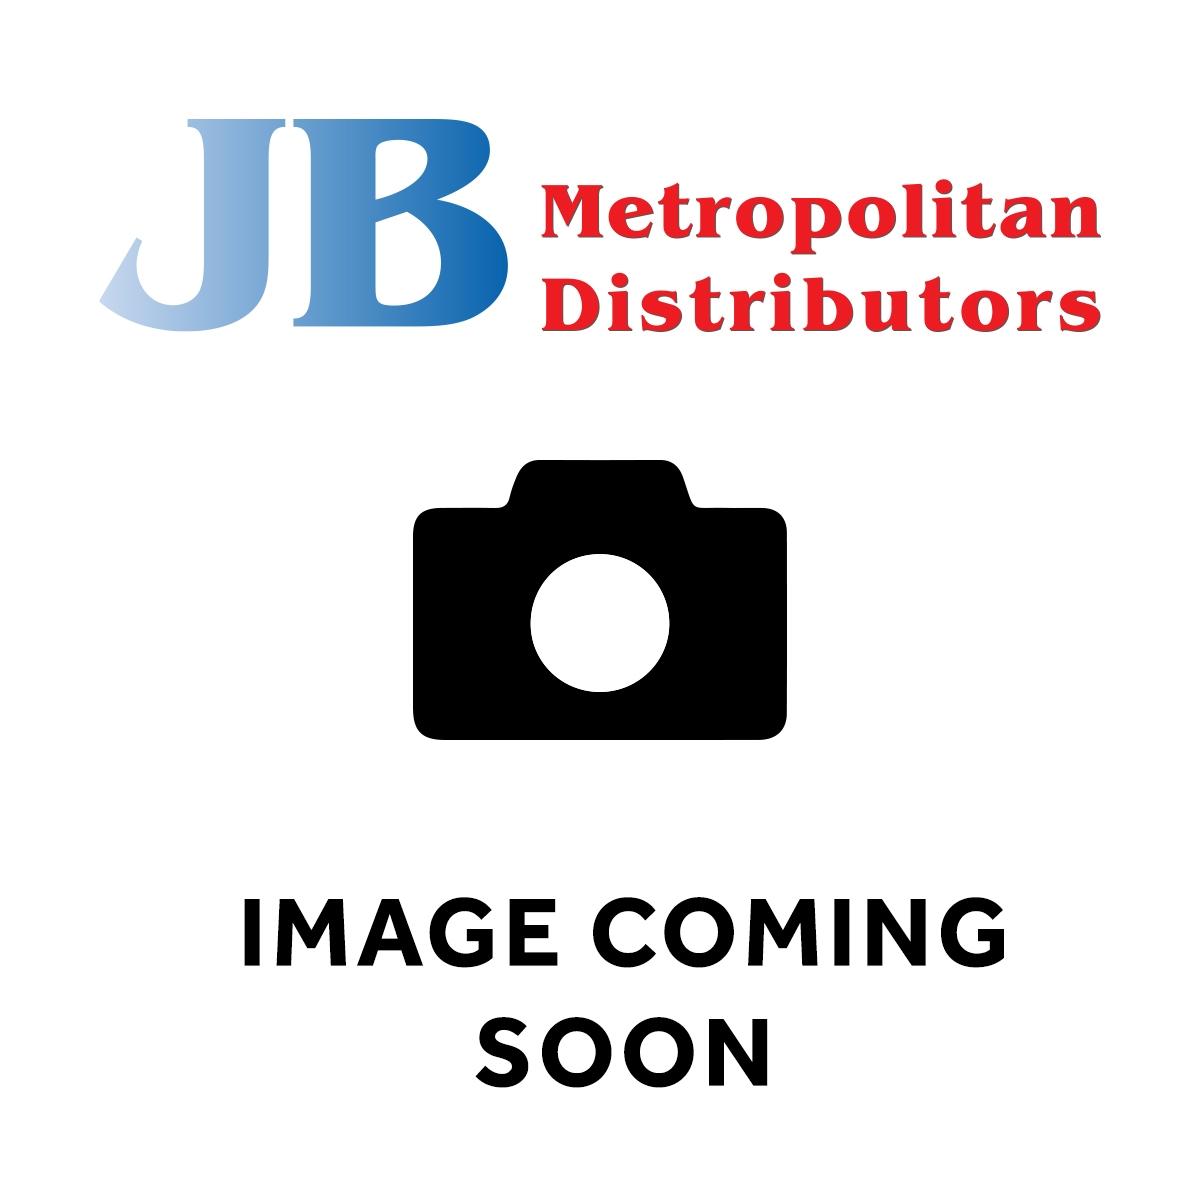 180G CADBURY MEDIUM BAG CARAMELLO KOALA